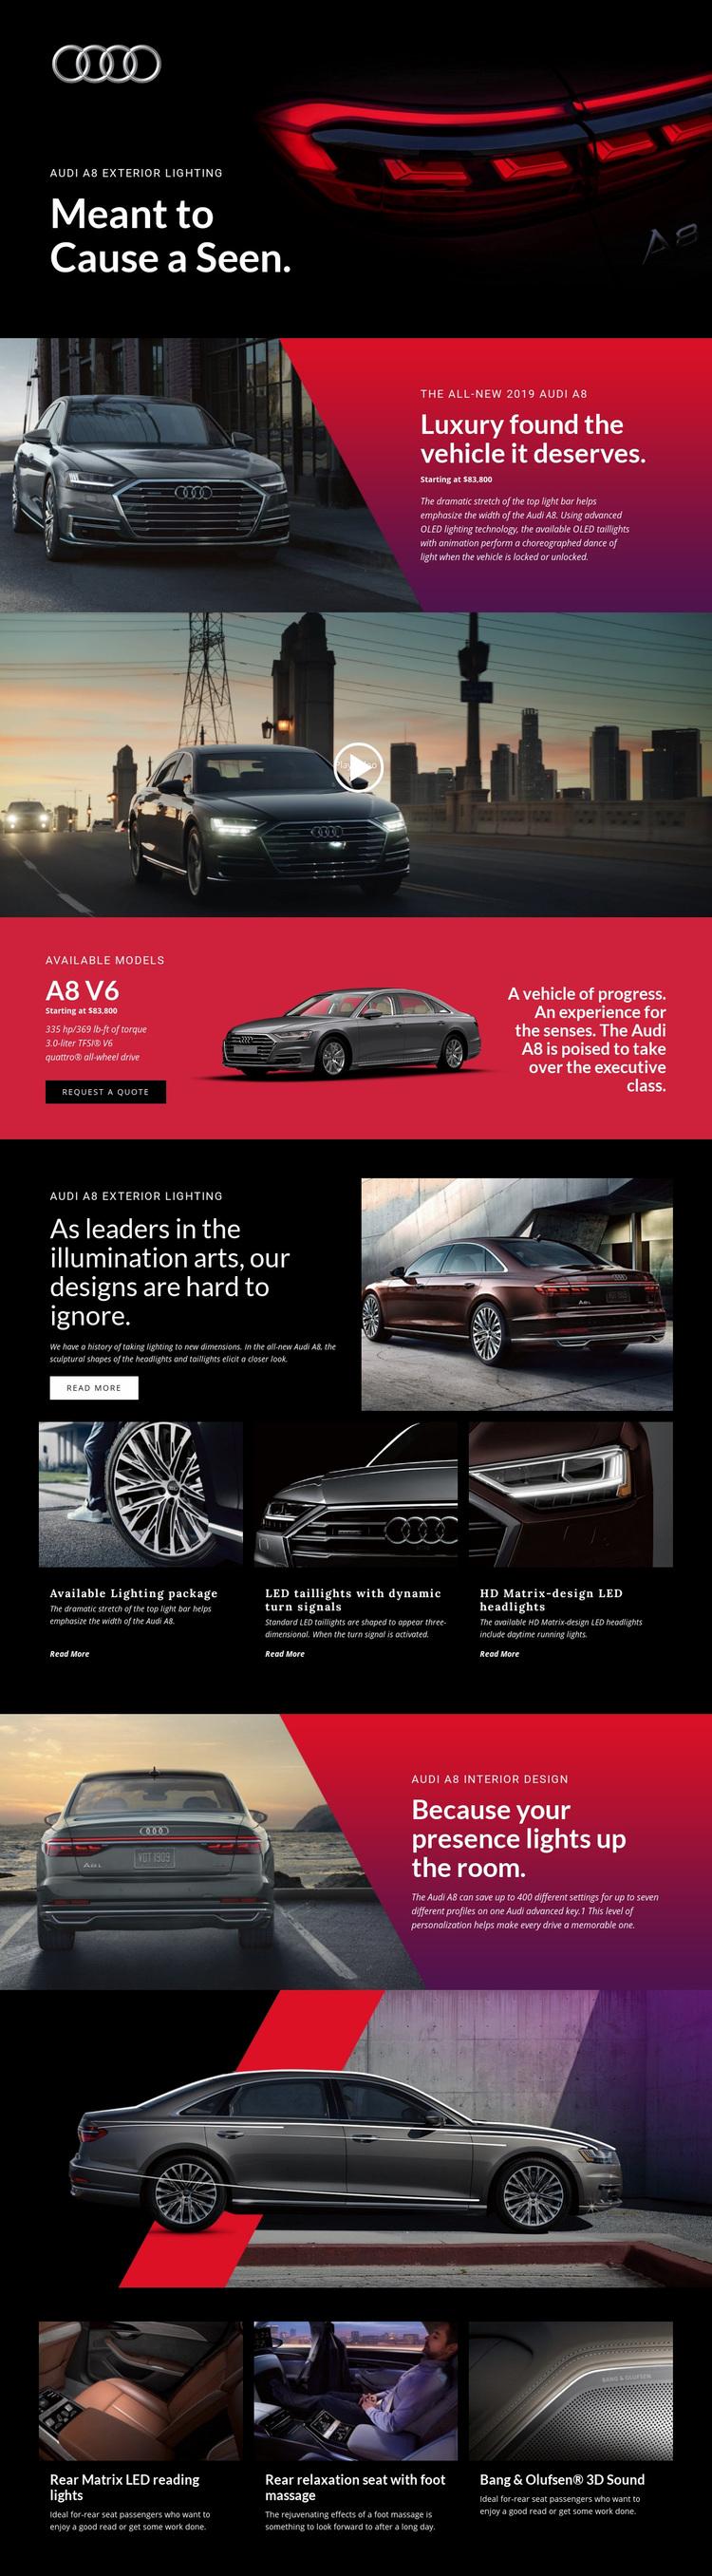 Audi luxury cars Web Page Designer